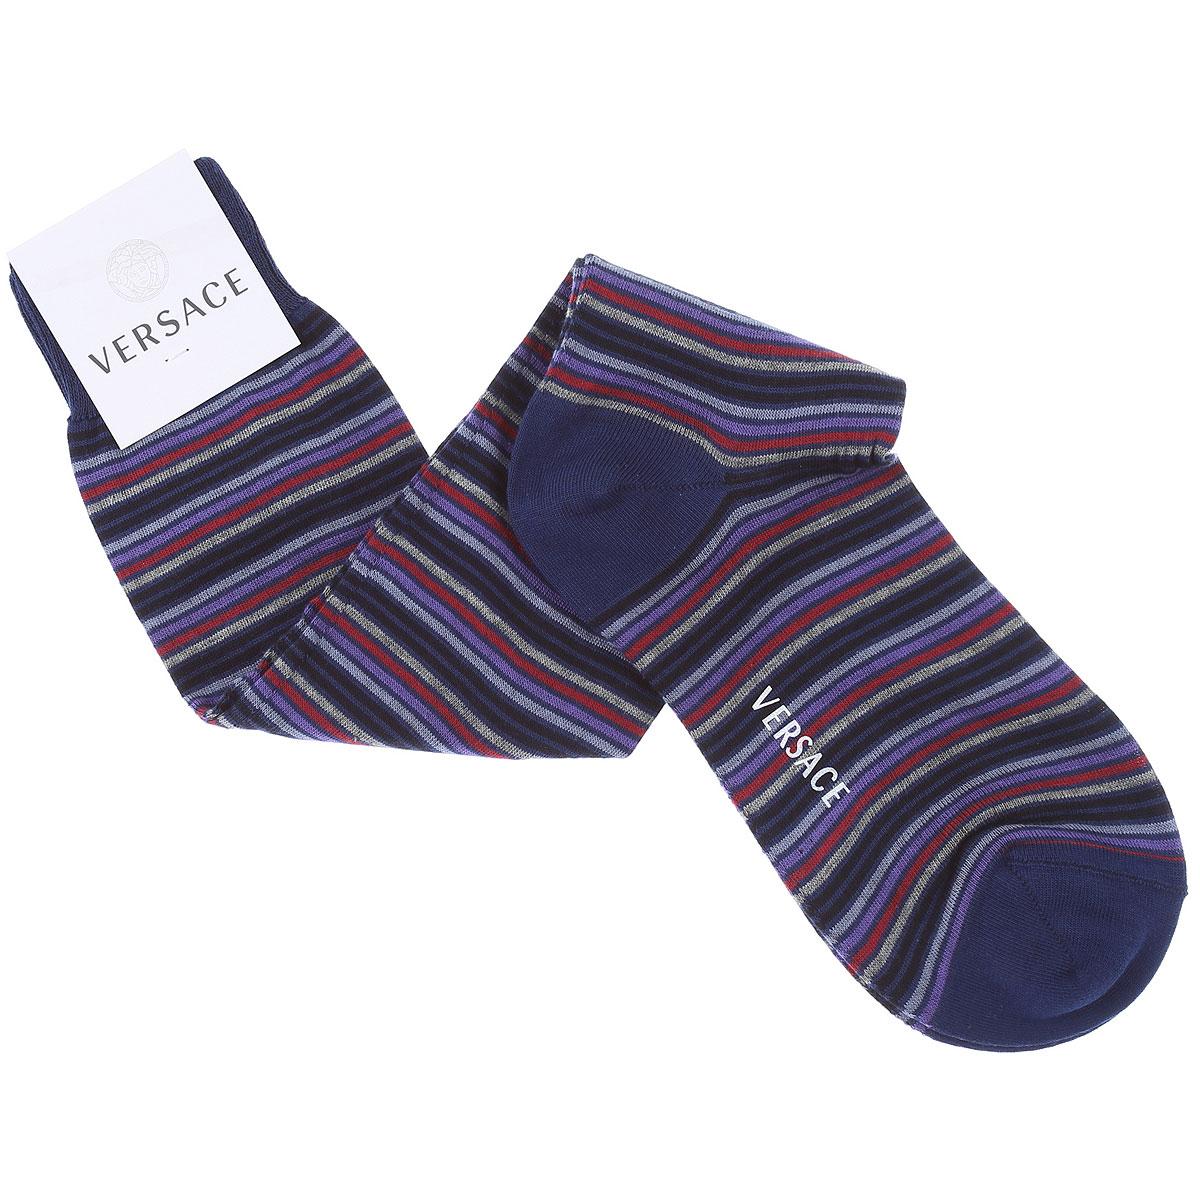 Versace Socks Socks for Men On Sale, Blue, Cotton, 2019, 10 (Shoe Size: EU 42 - US 8) 11 (Shoe Size: EU 43 - US 9)